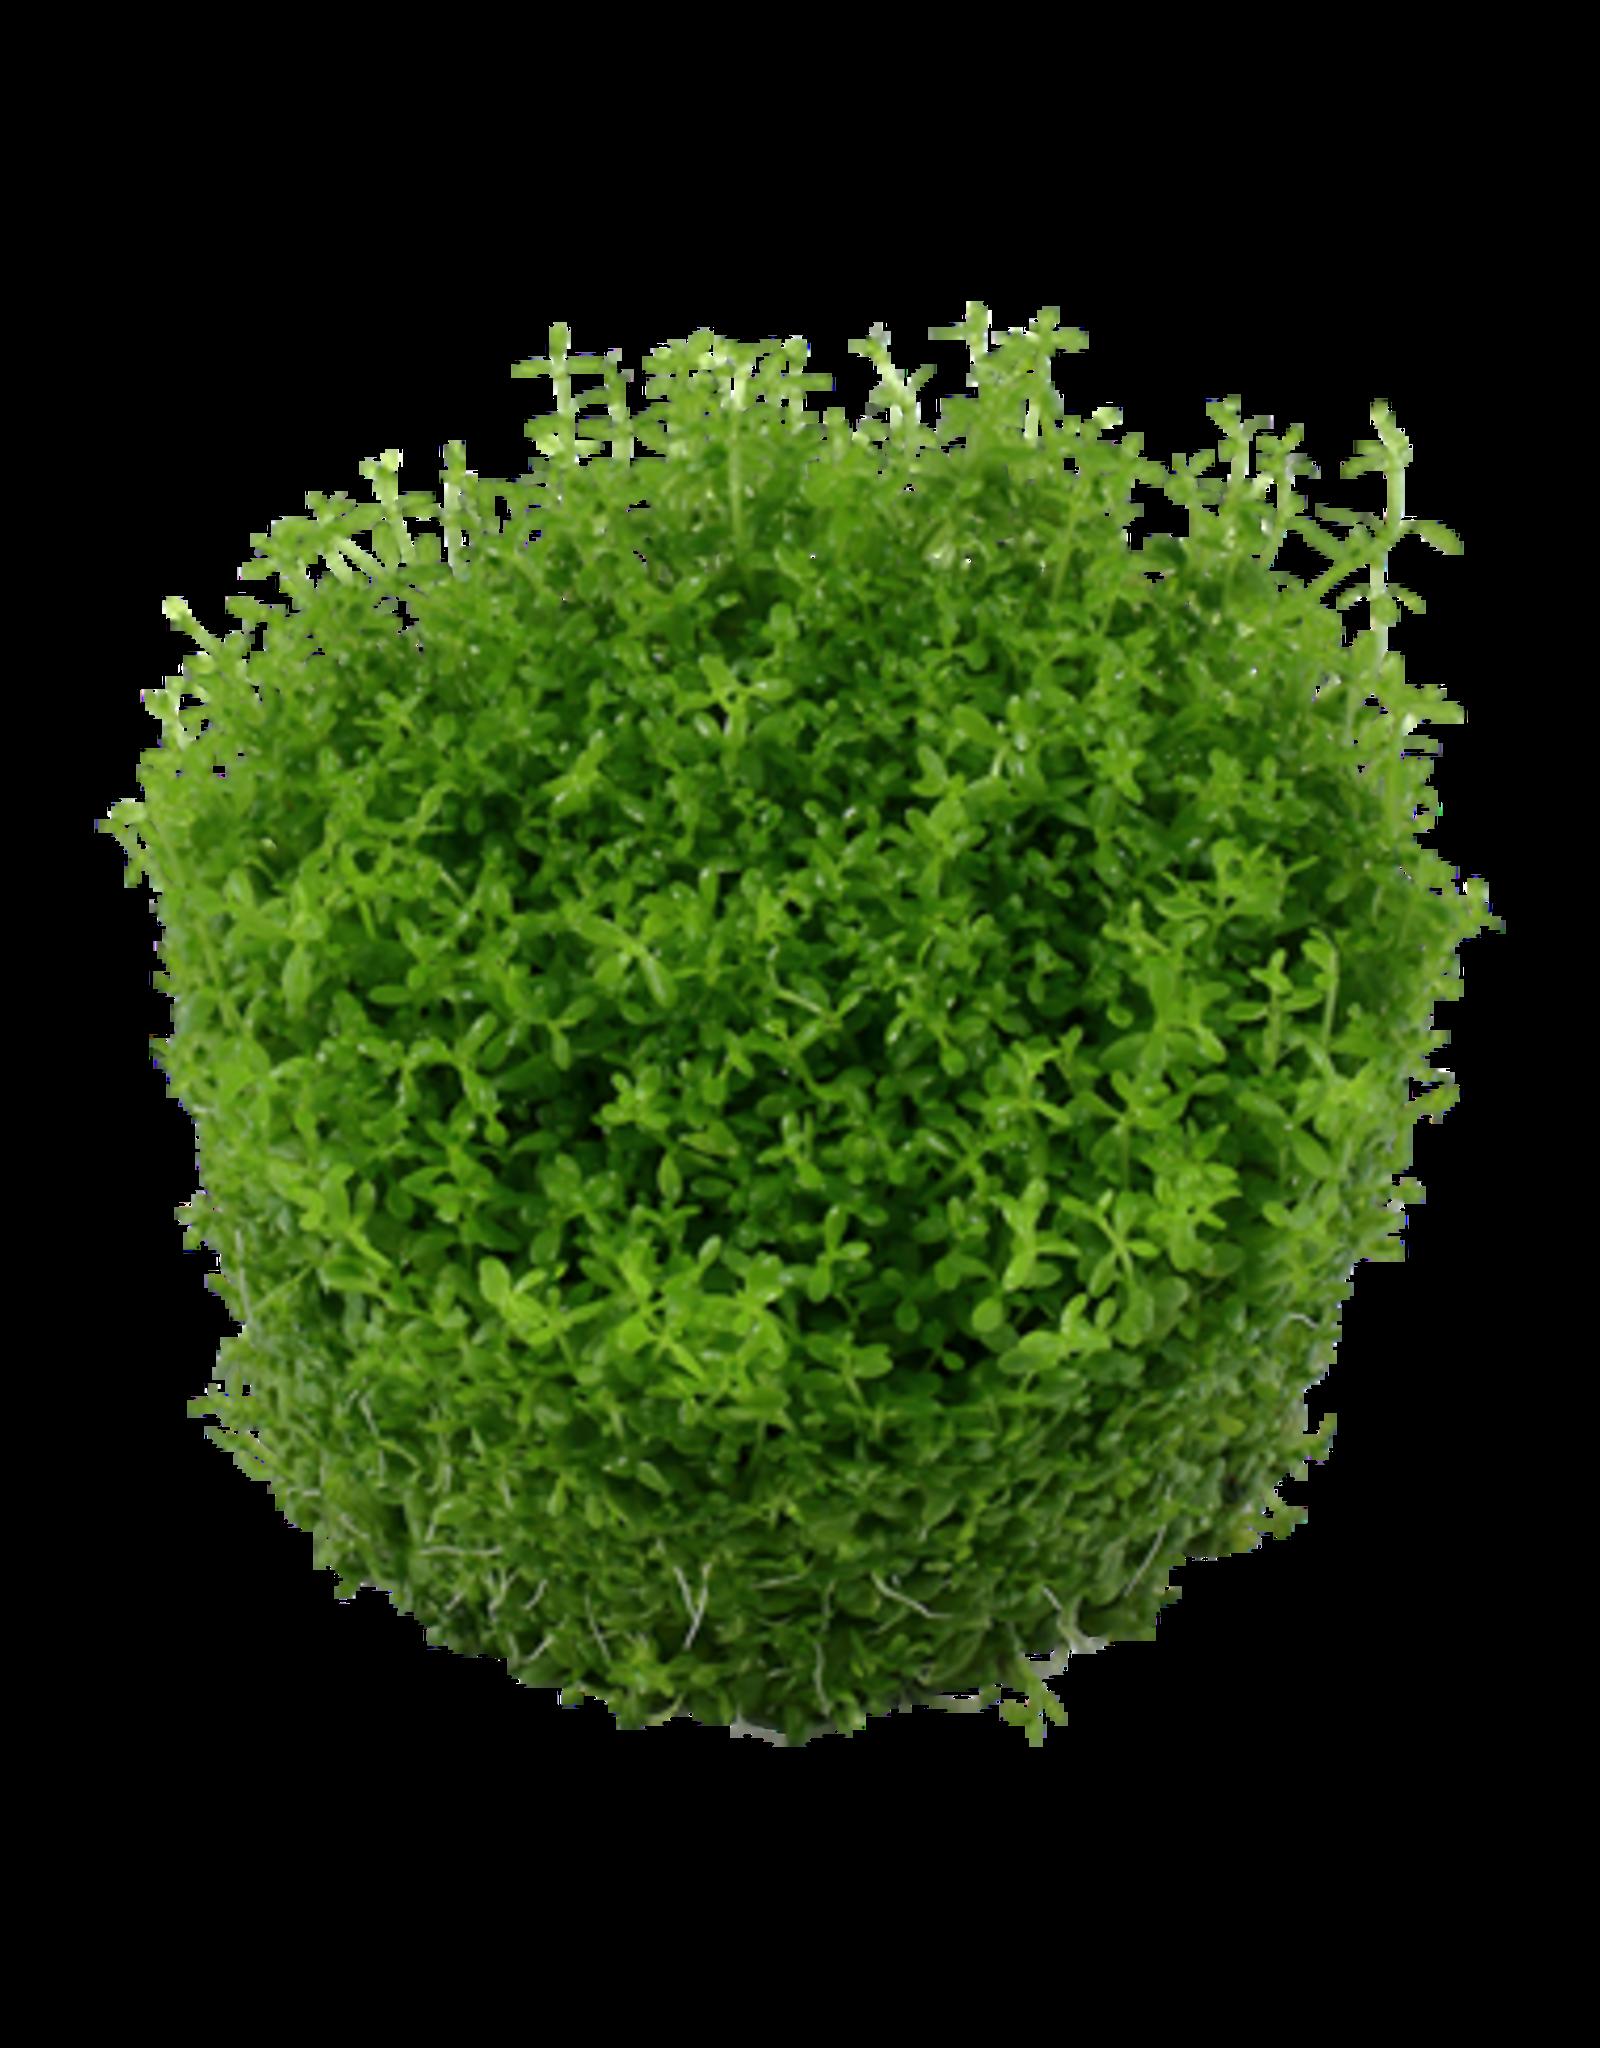 Tropica 1-2-GROW! Hemianthus callitrichoides 'Cuba'